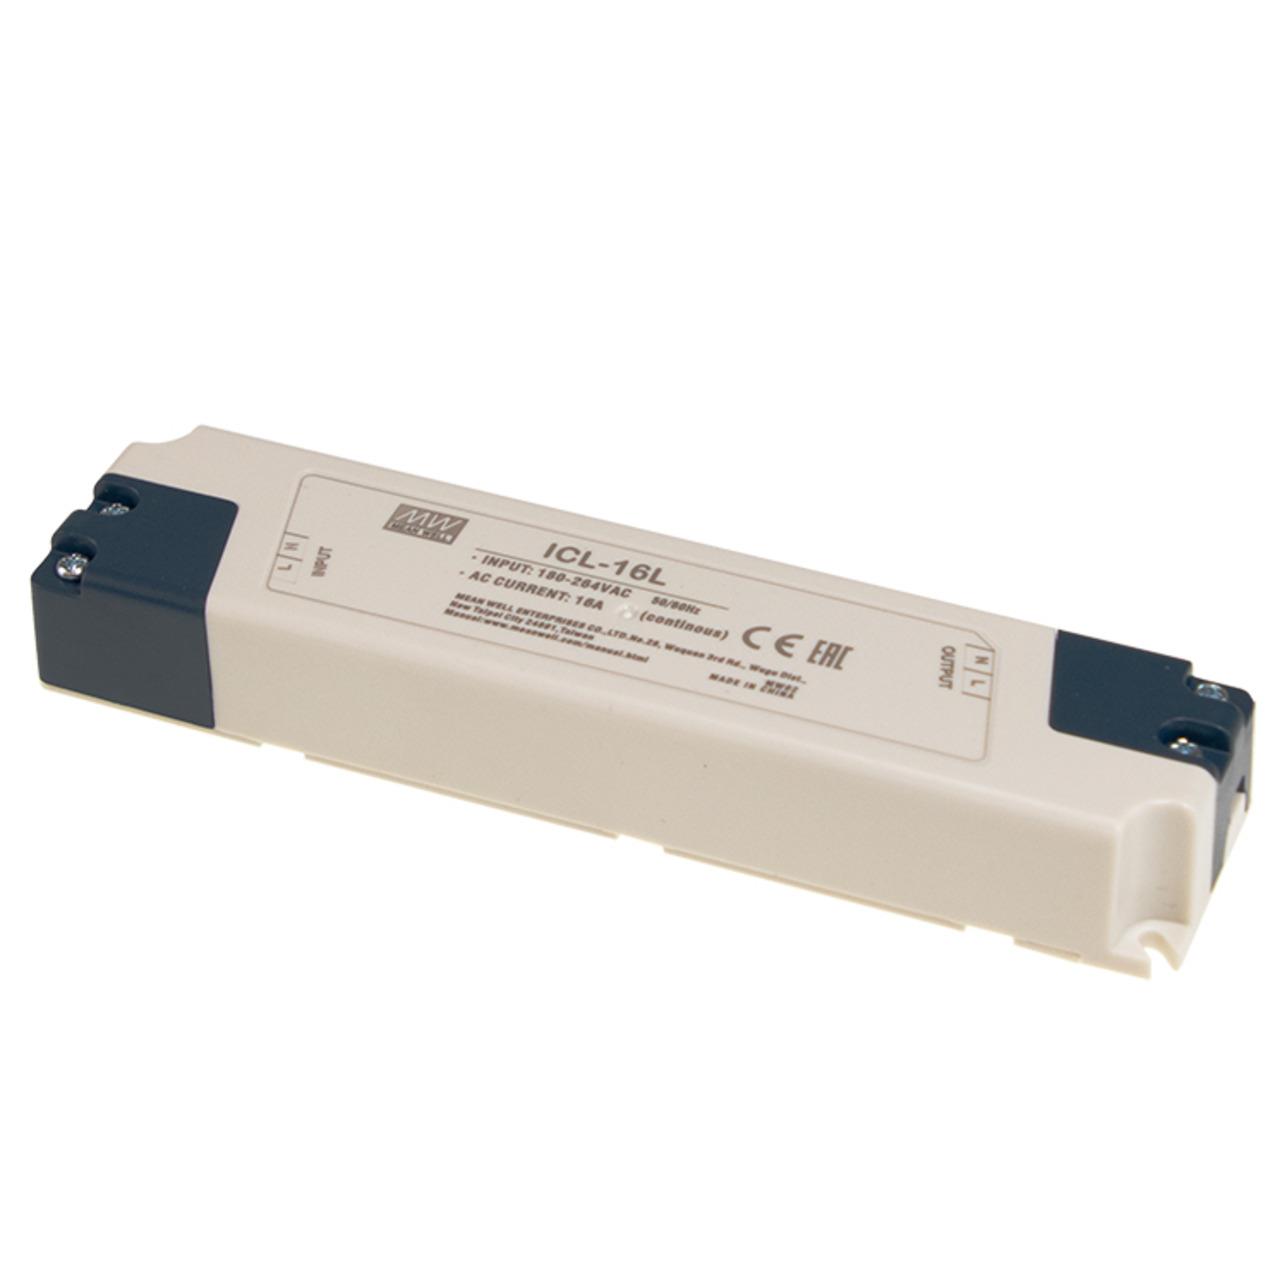 Mean Well Einschaltstrombegrenzer ICL-16L- 230 VAC